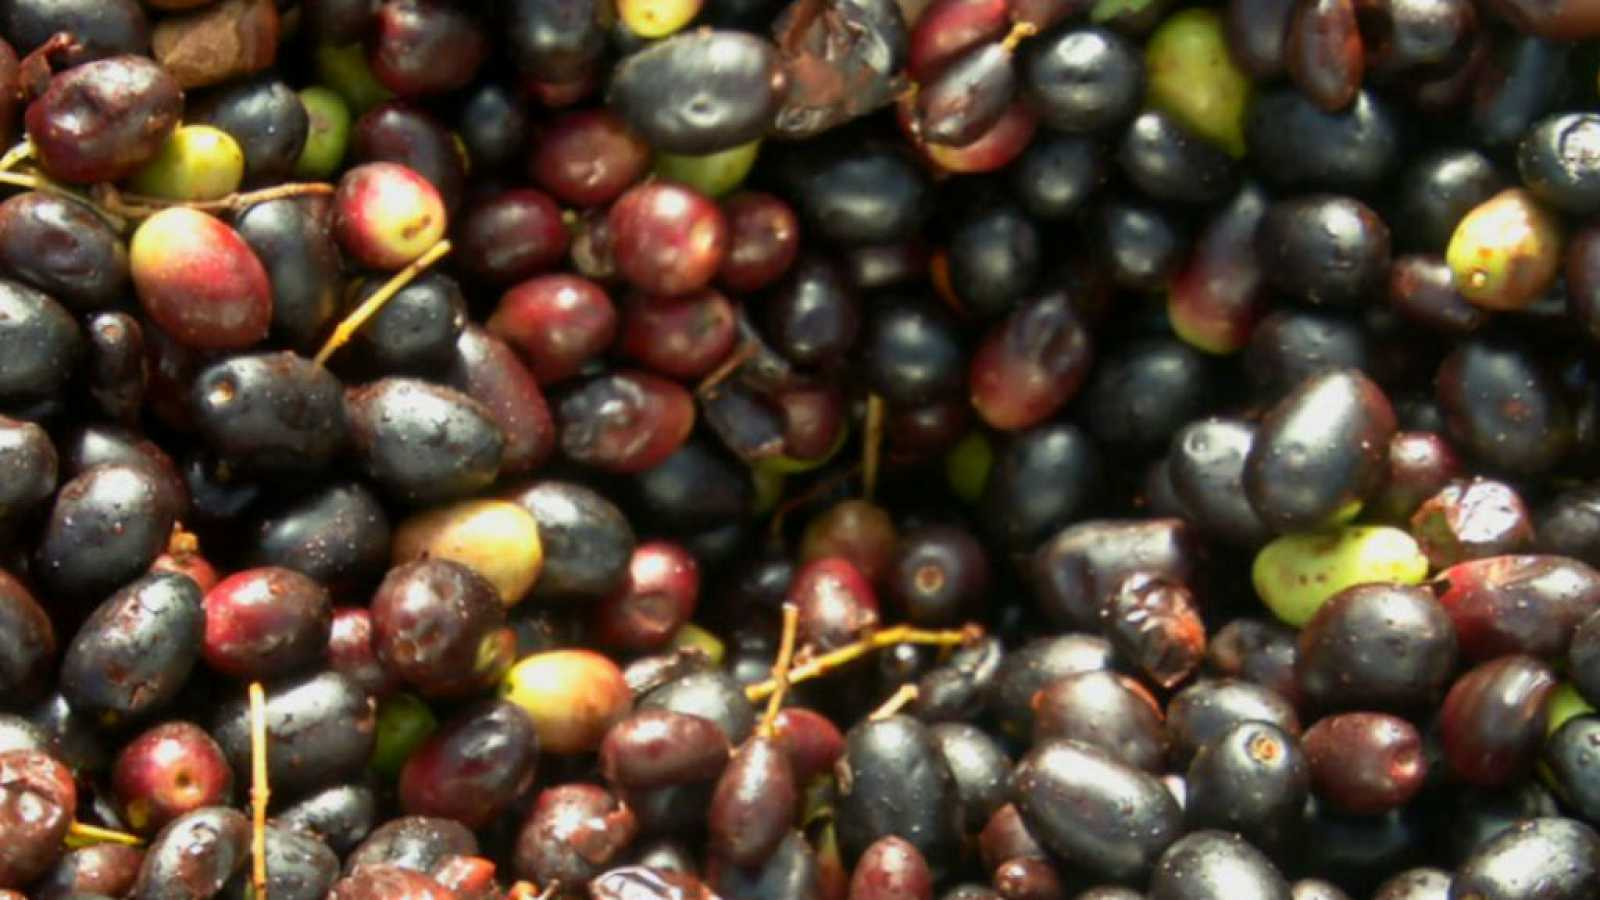 Introducción al aceite vegetal de acebuche silvestre